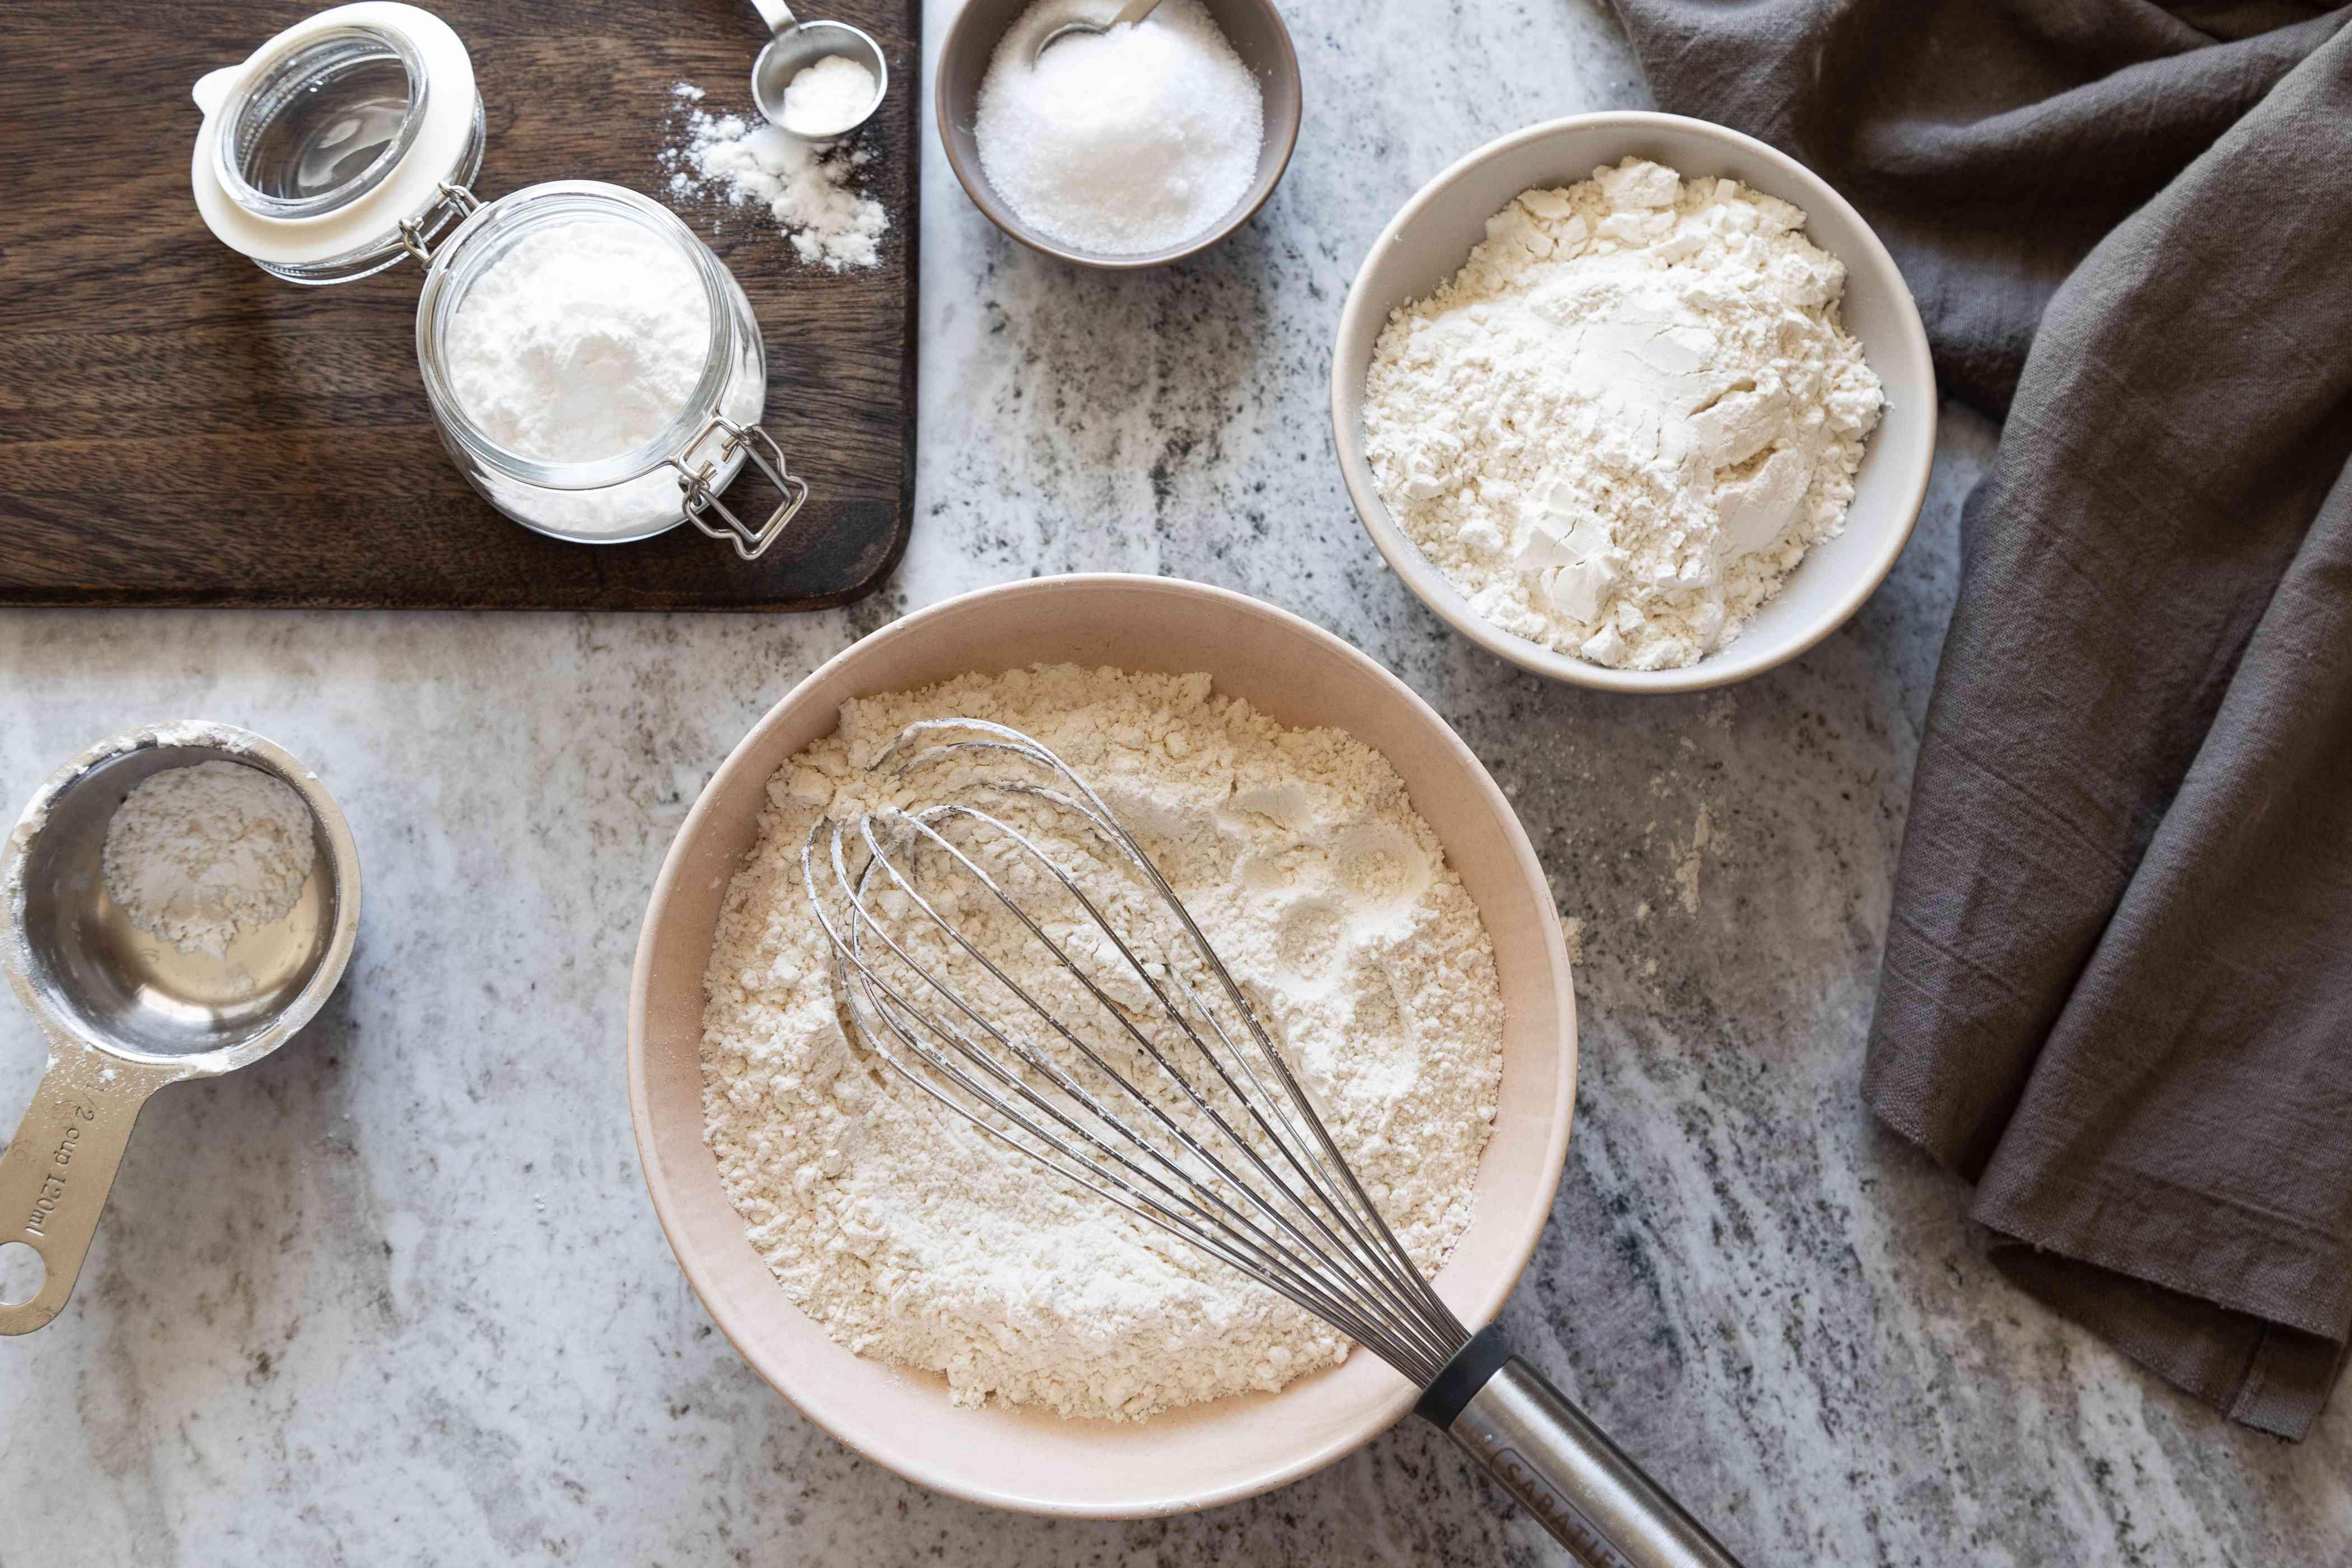 Bowls of flour baking soda salt self-rising flour recipe